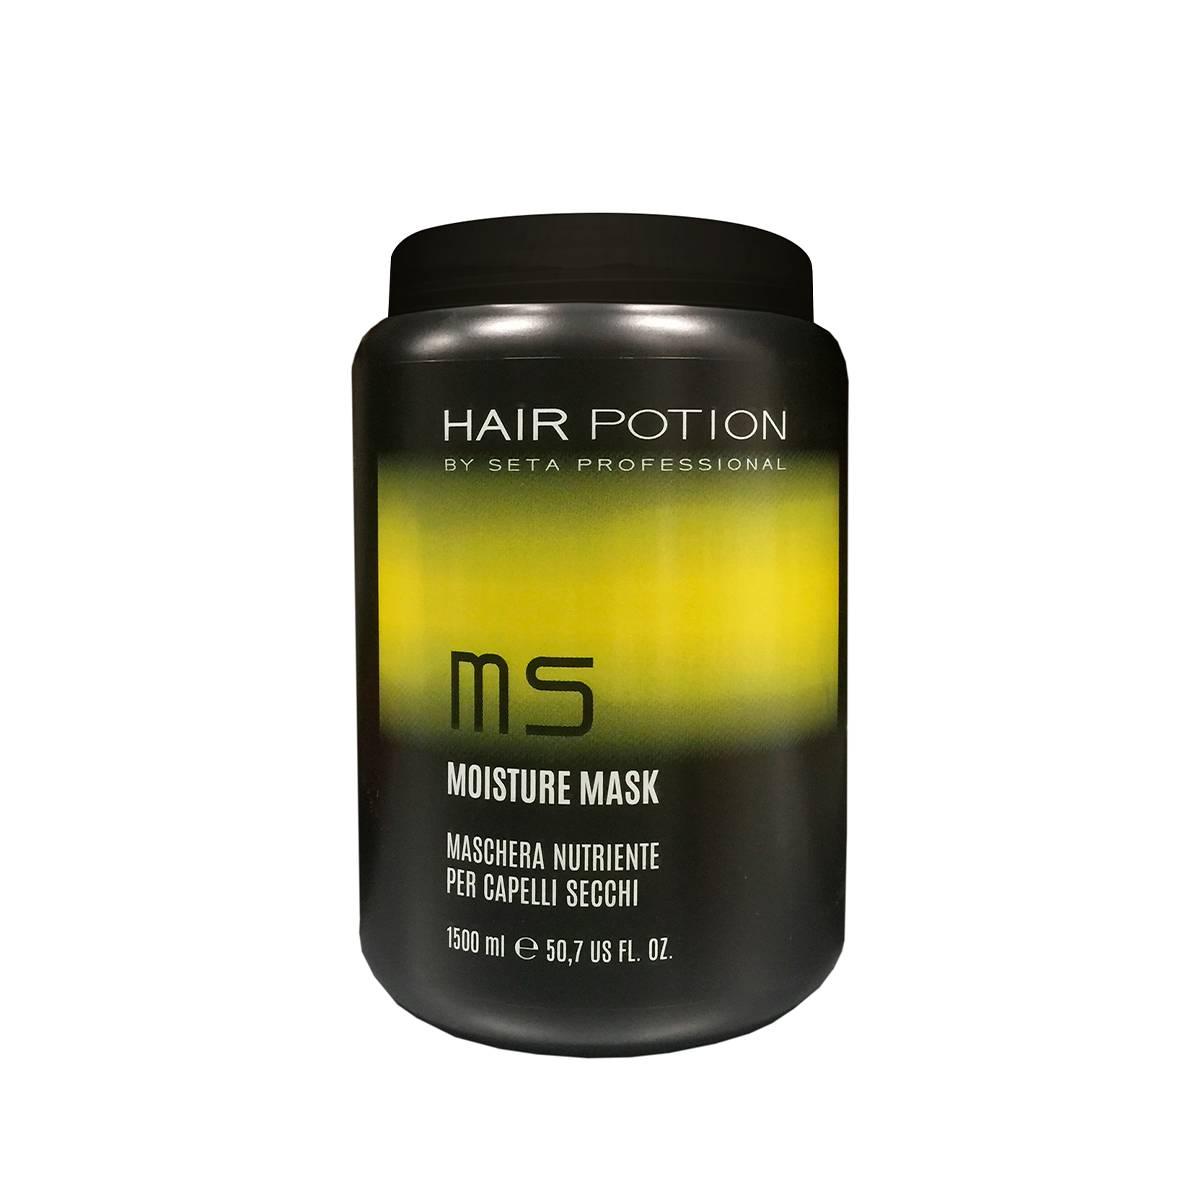 Hair Potion Pro Moisture Mask 1500ml